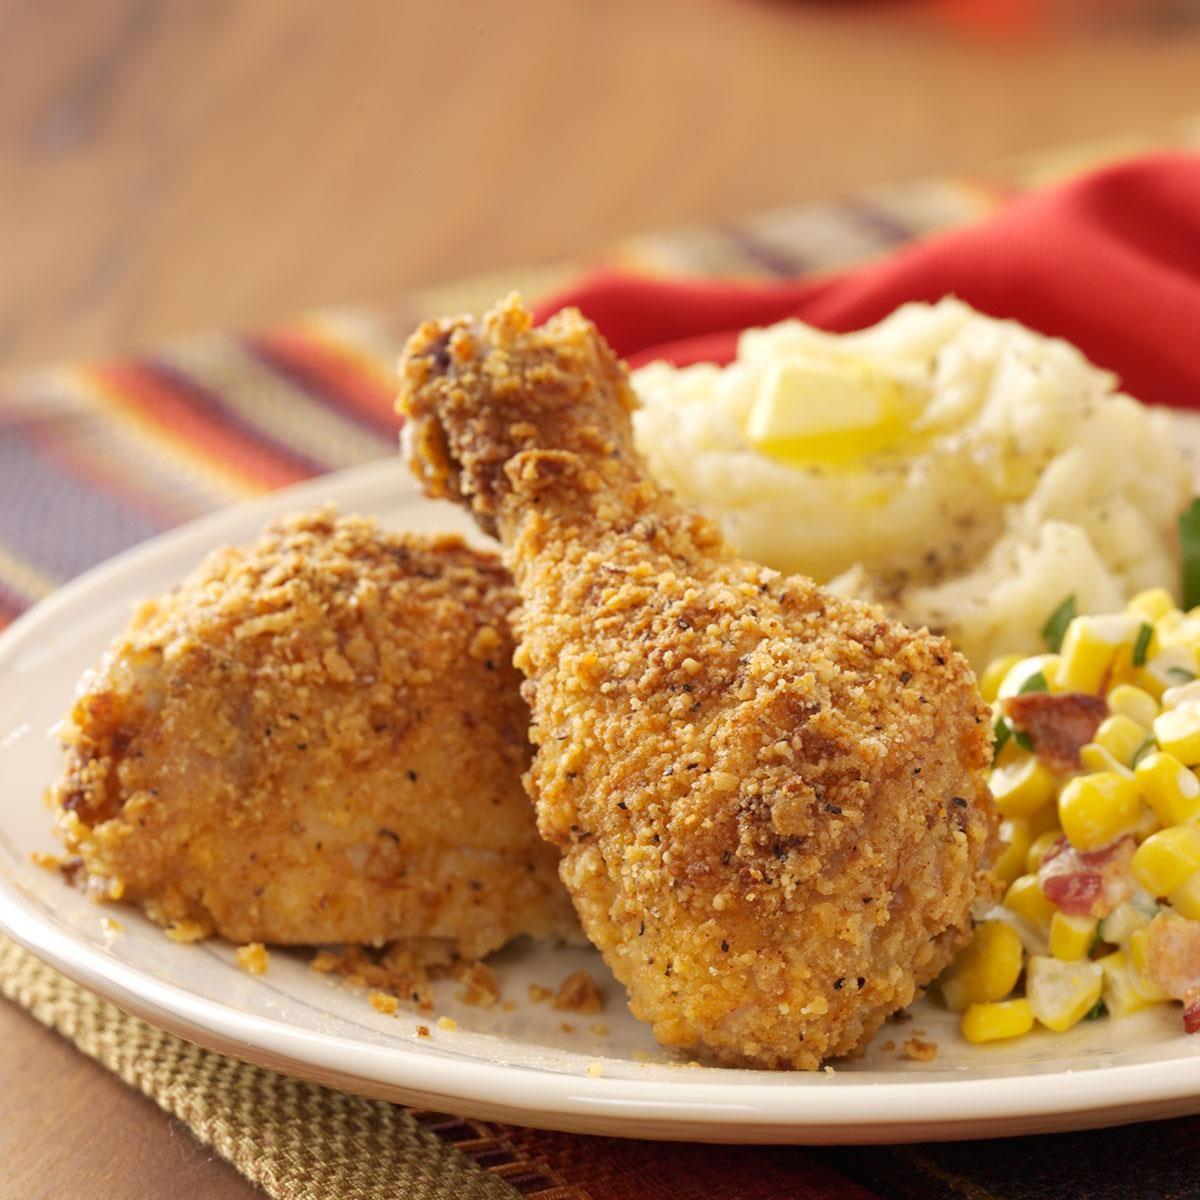 Baked Crunchy Chicken Recipe | Taste of Home